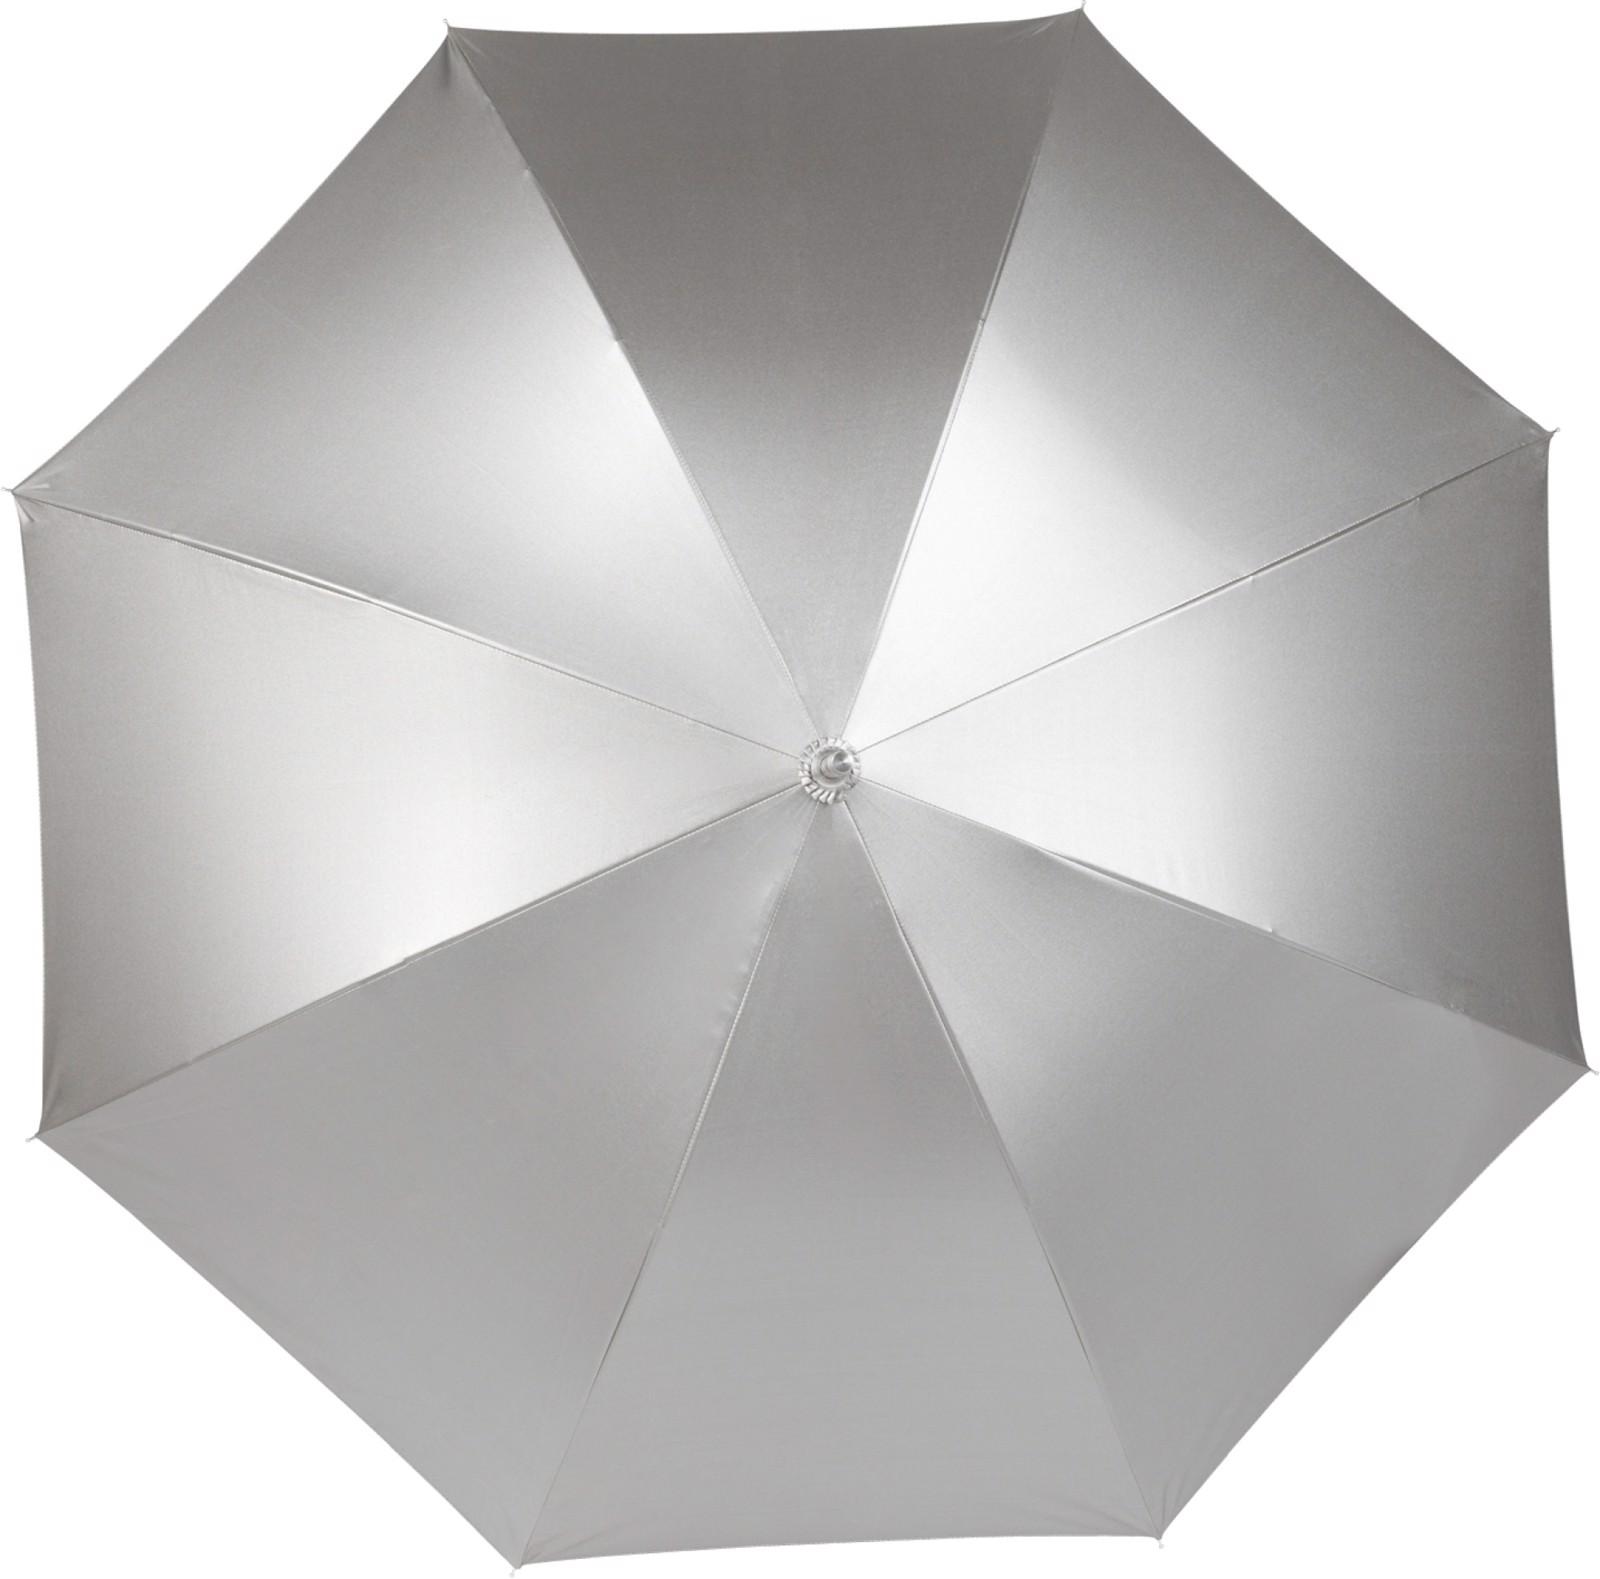 Pongee (190T) umbrella - Silver